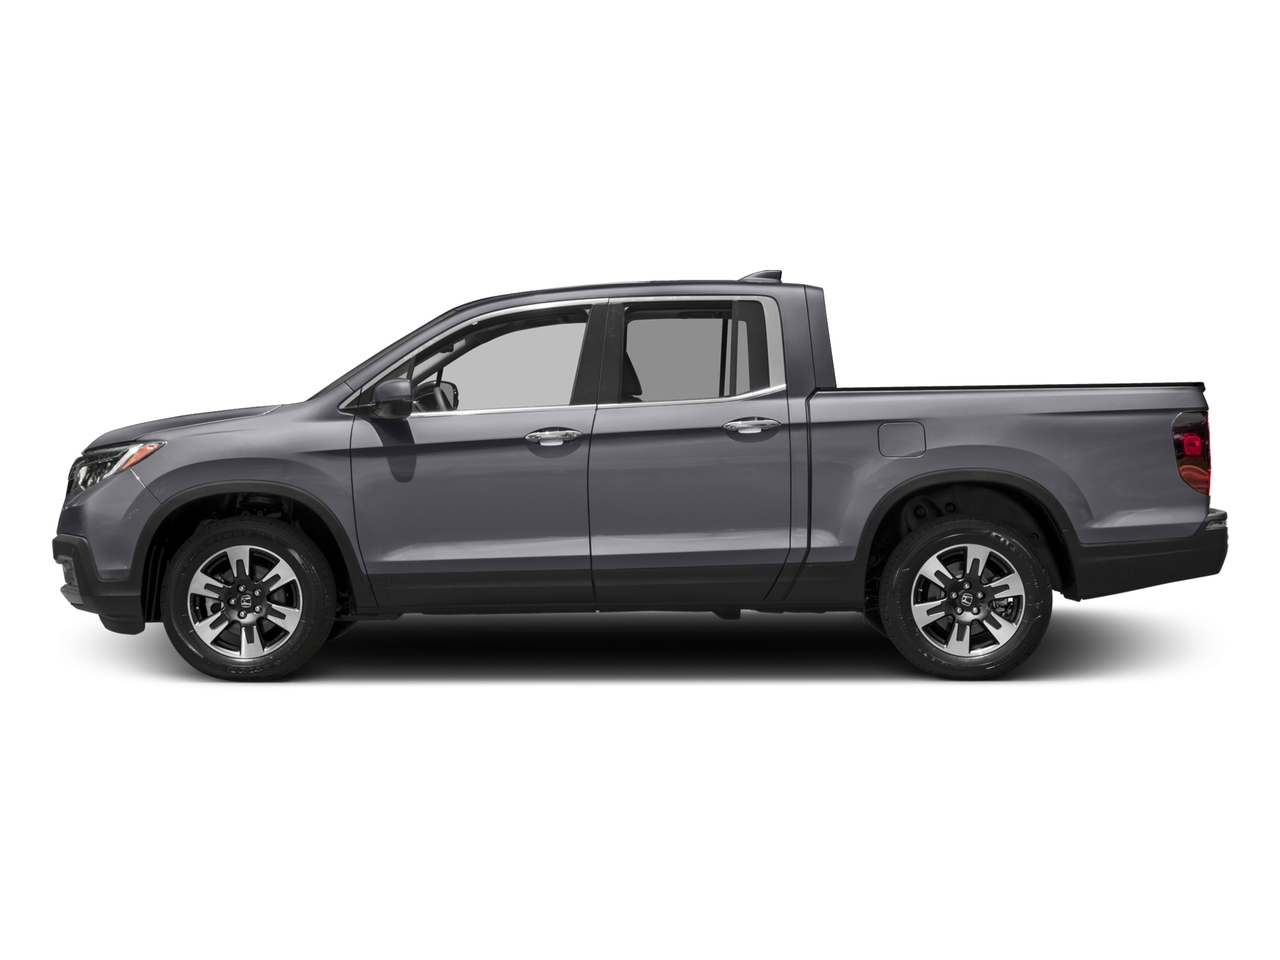 2017 honda ridgeline wessel honda new truck deals for 2017 honda ridgeline configurations